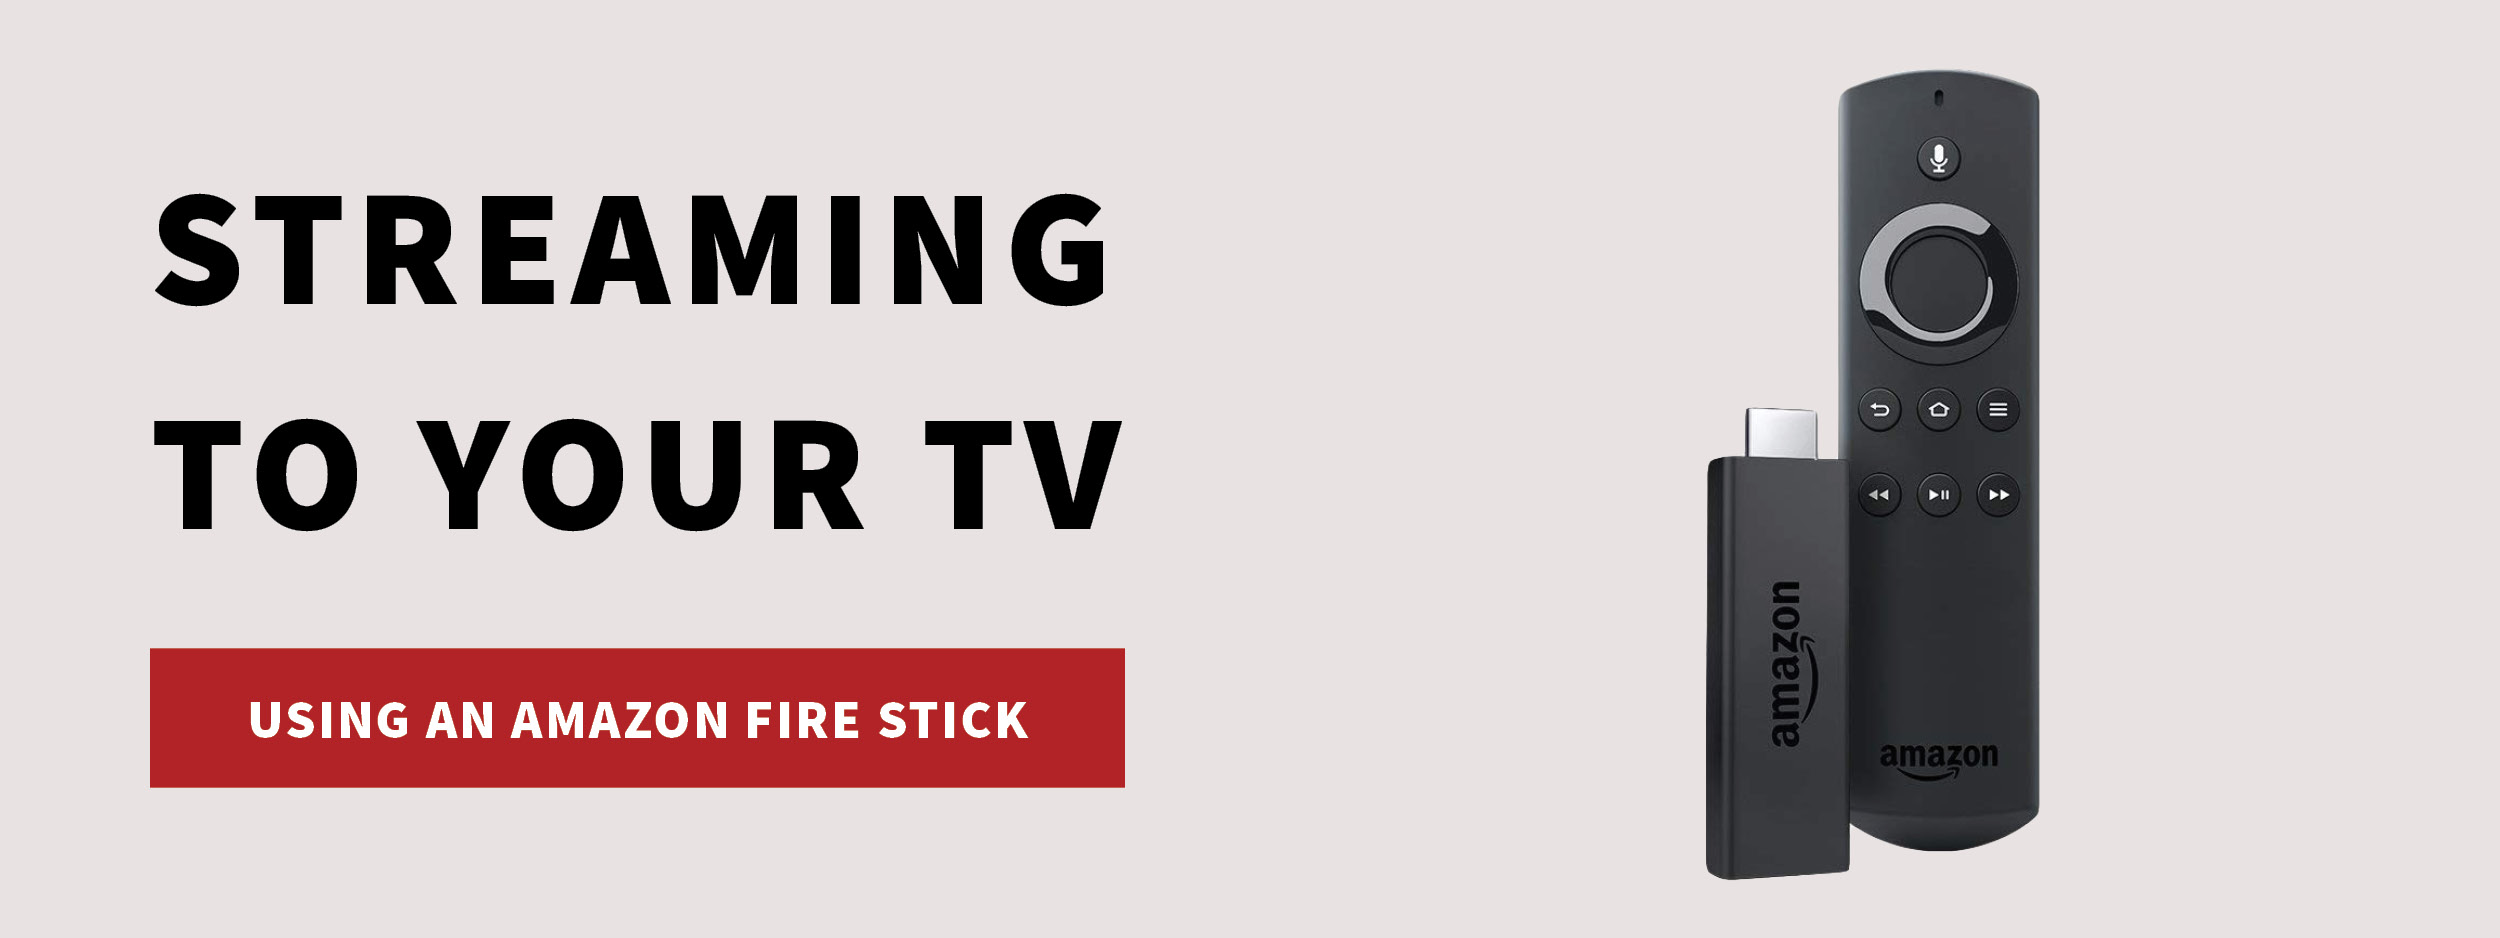 Stream using Amazon Fire TV